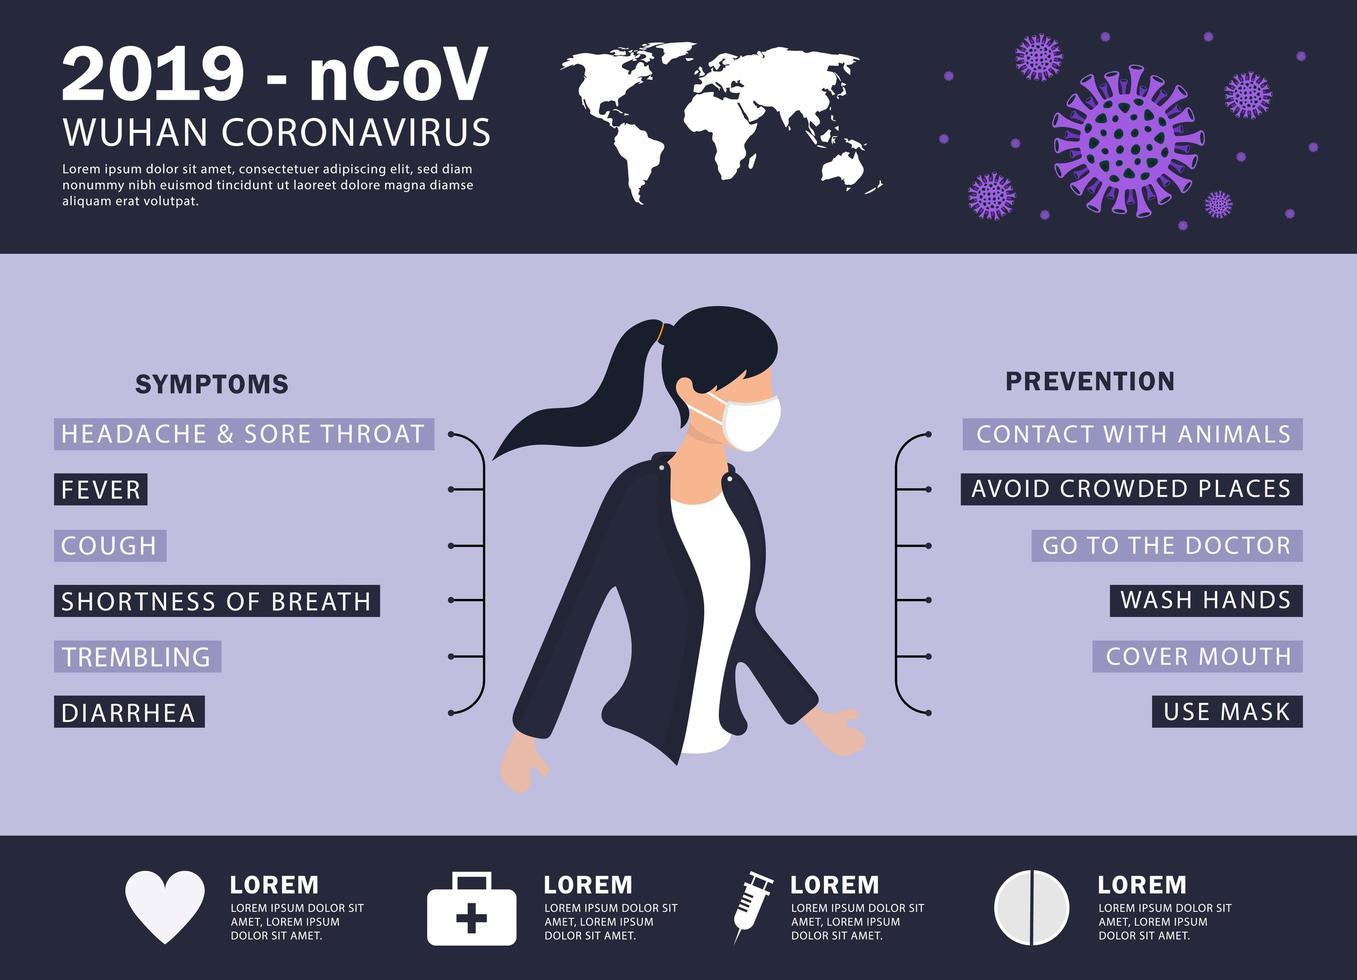 coronavirus covid-19 of 2019-ncov paars infographic vector